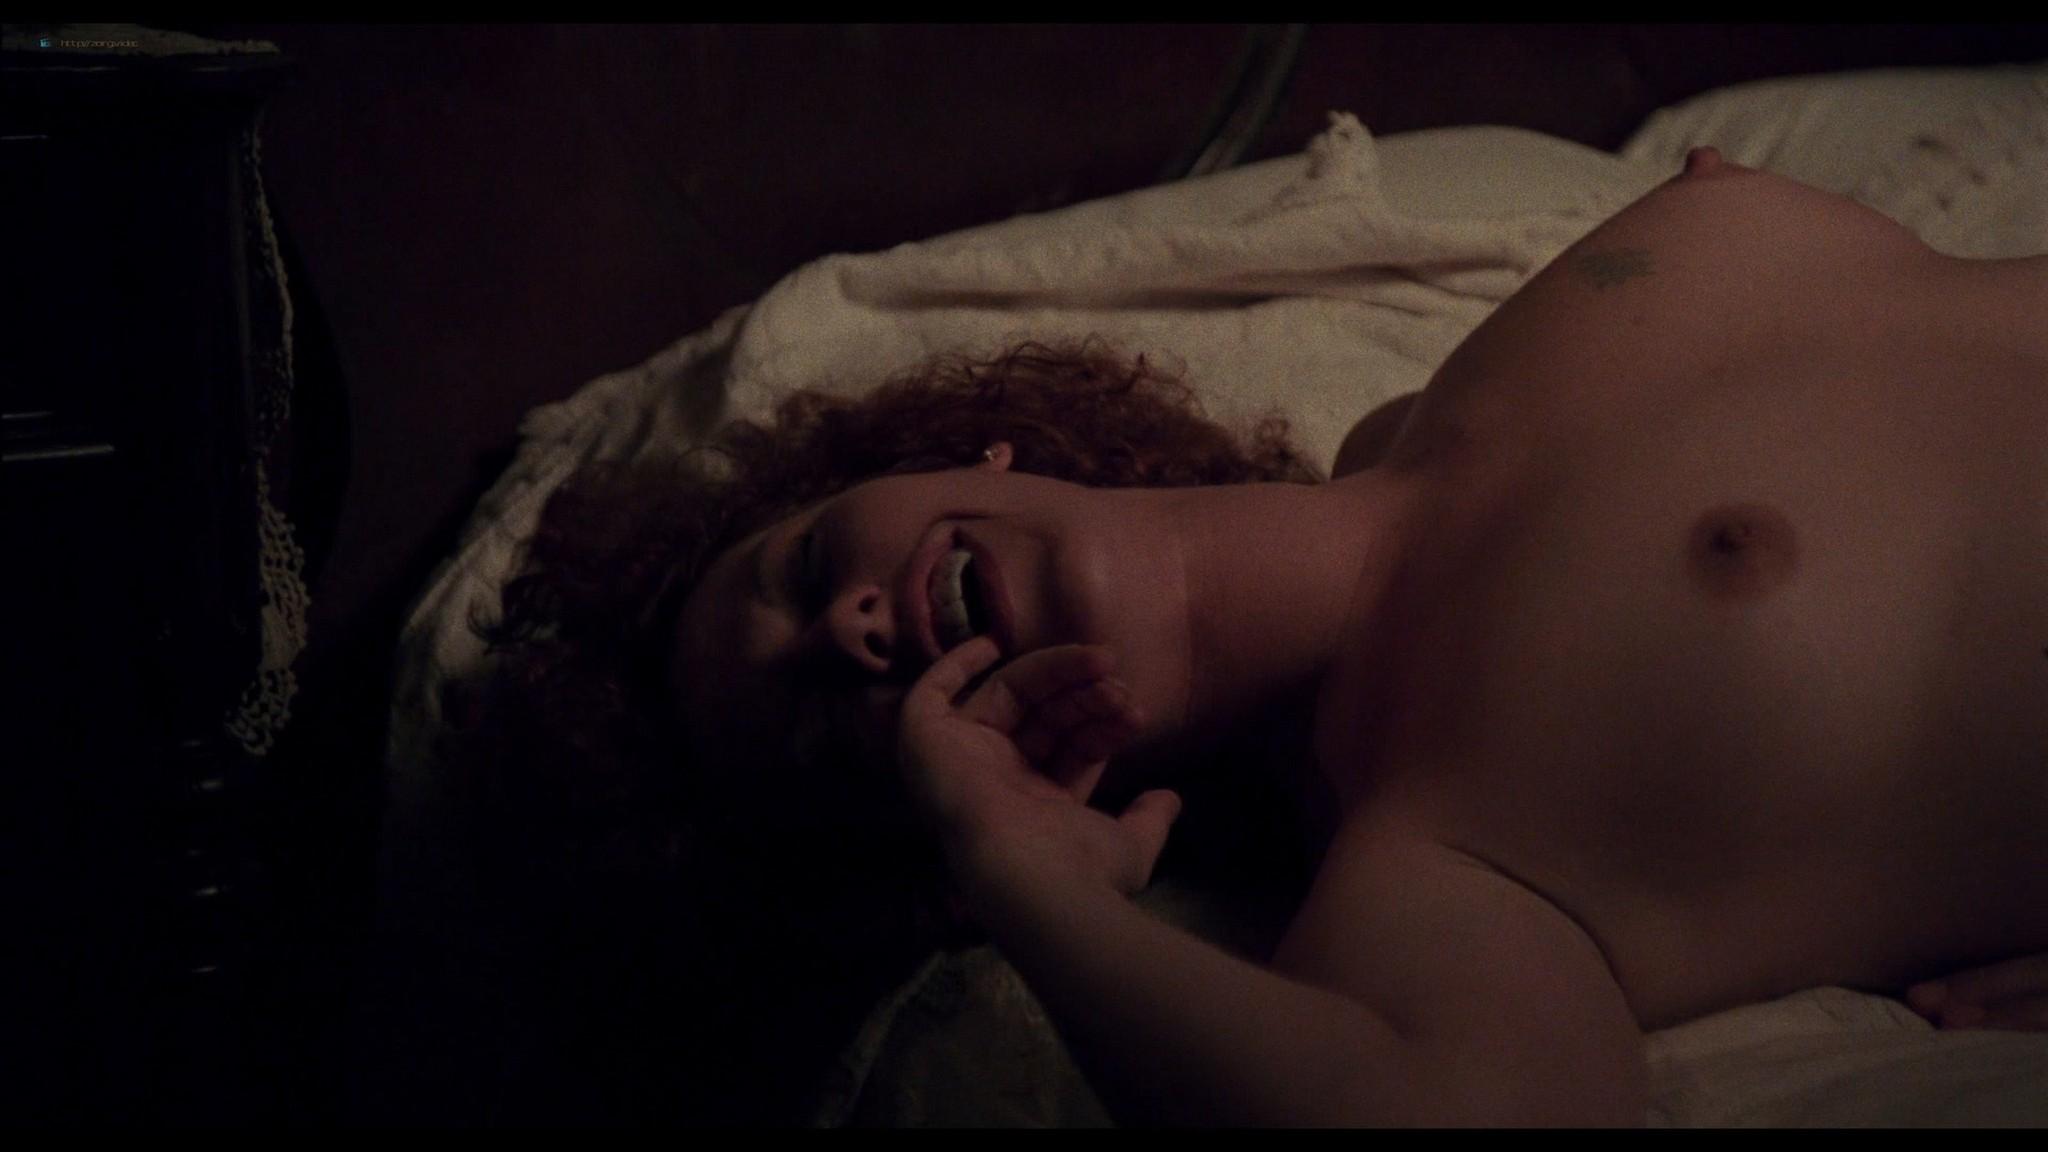 Jennifer Delora nude hot sex - Deadly Manor (1990) HD 1080p BluRay (5)